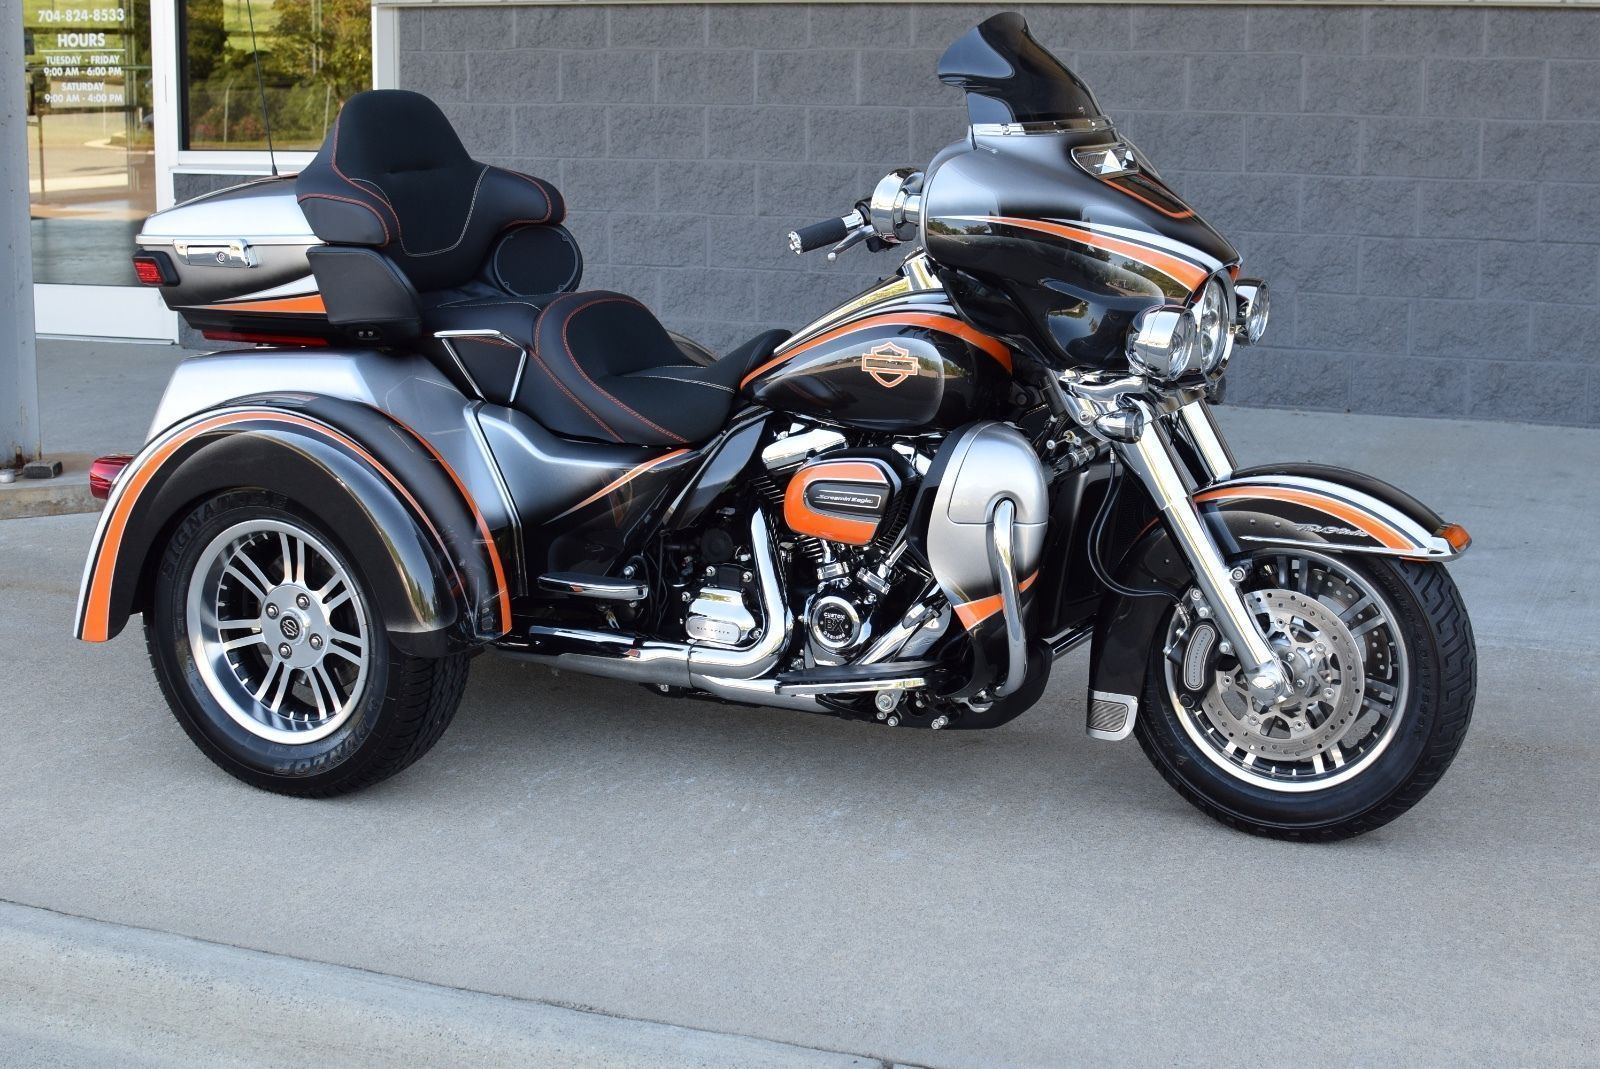 2017 Harley Davidson Tri Glide Trike Custom Flawless Retail Price